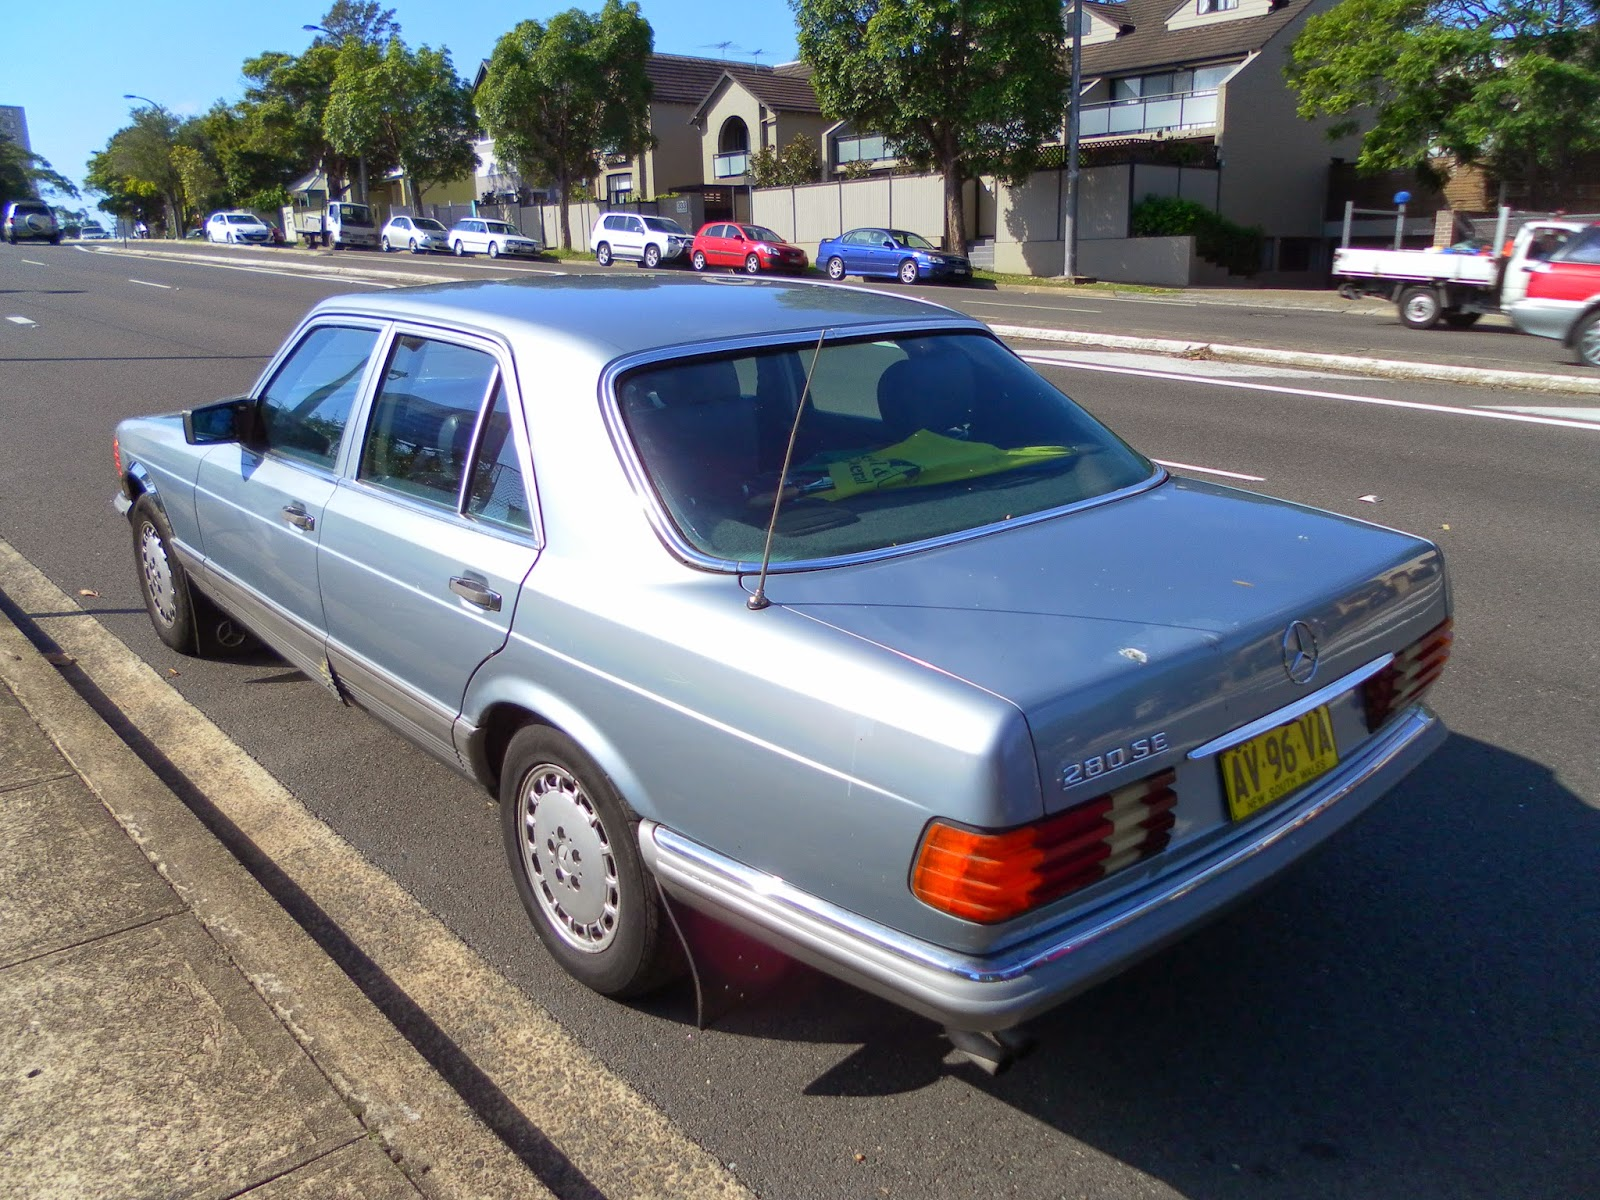 aussie old parked cars 1982 mercedes benz w126 280 se. Black Bedroom Furniture Sets. Home Design Ideas